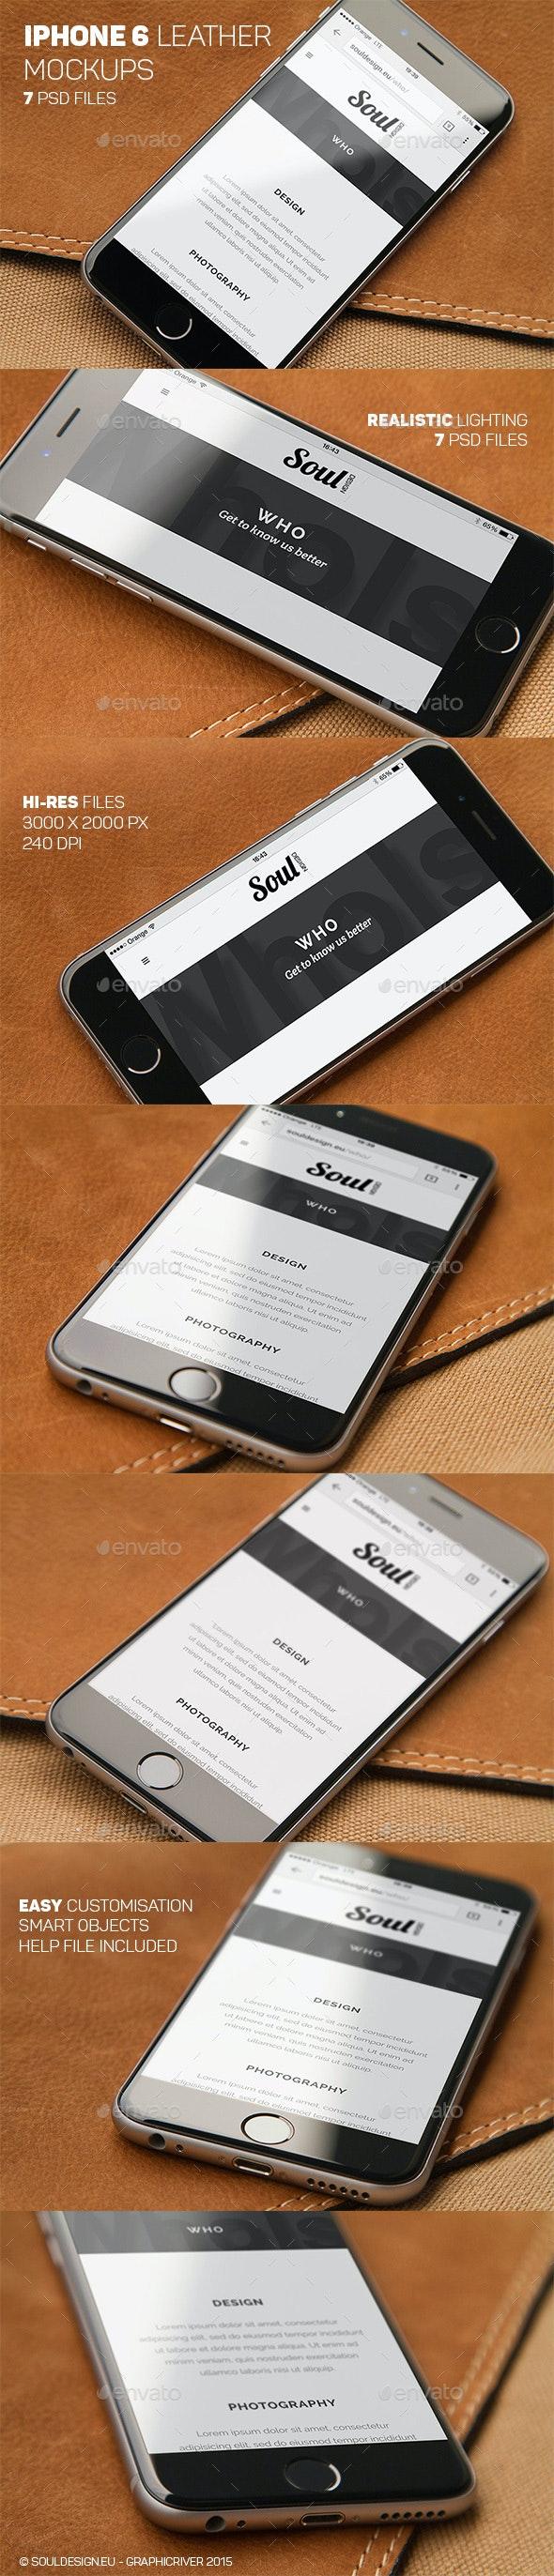 iPhone 6 Closeup Mockups Leather - Mobile Displays